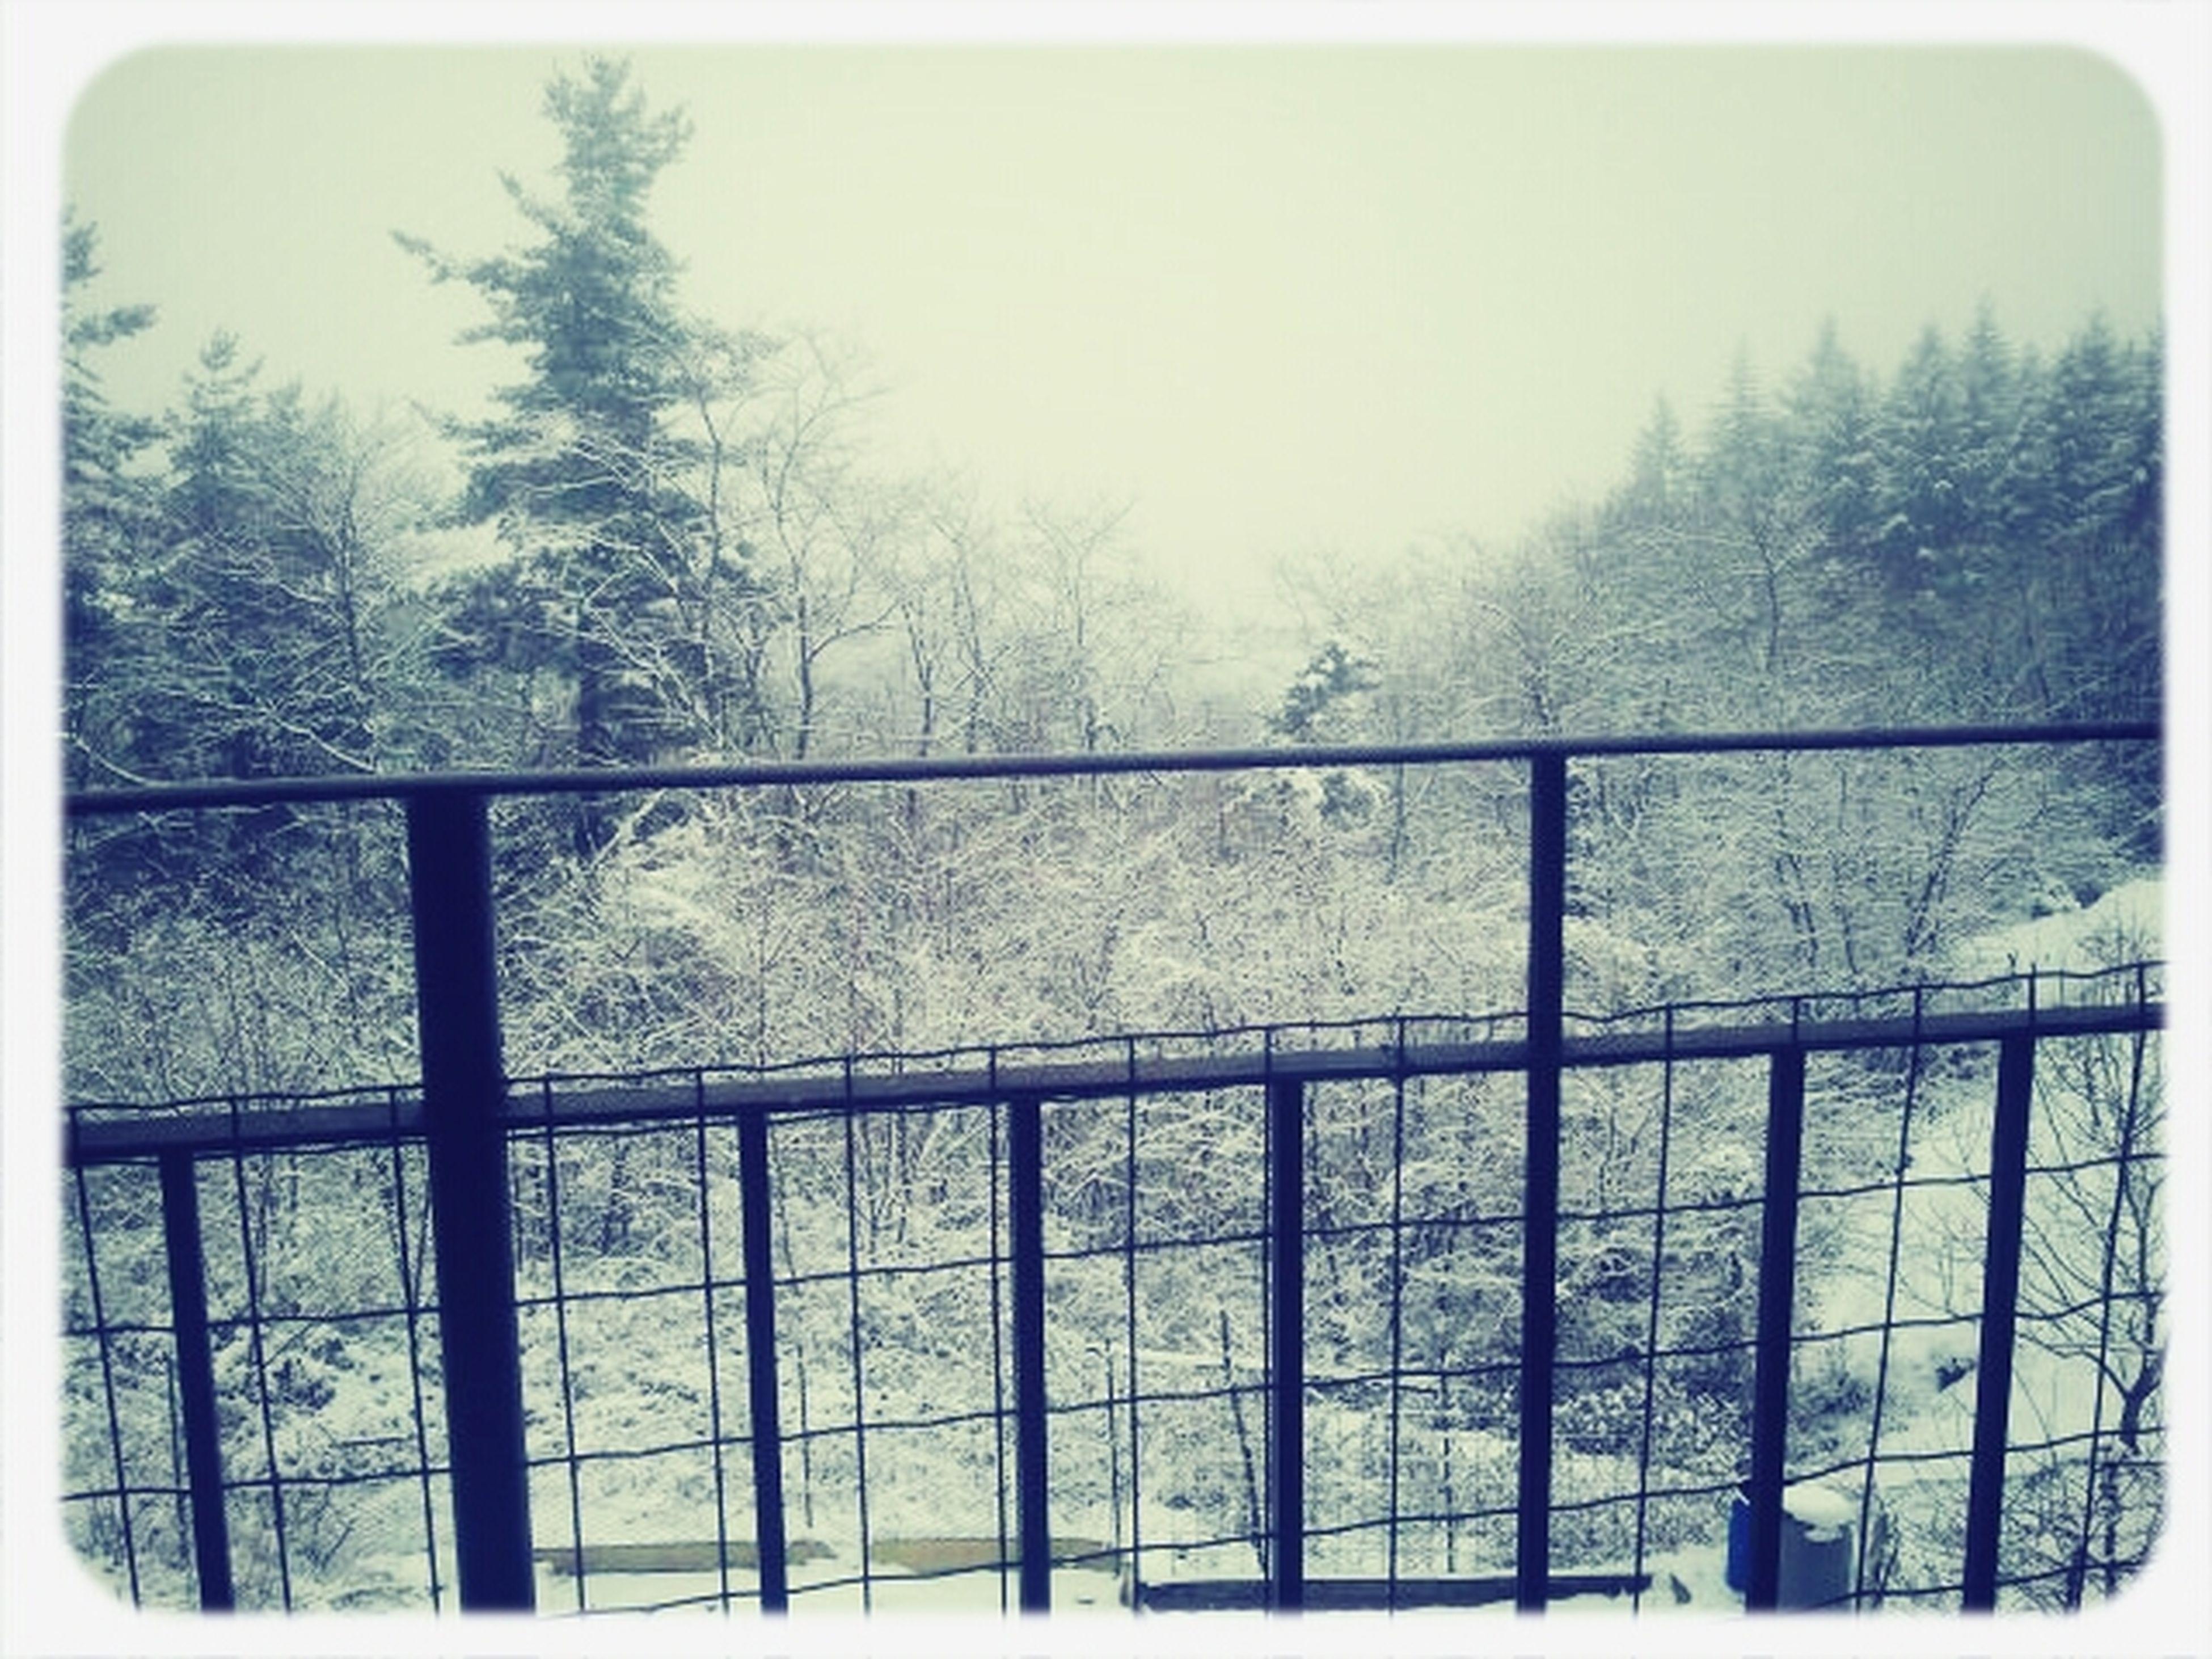 today.. :-) snowiiinnng Taking Photos Winter Photo Snow Photography Snowing Mobilephotography Mobilephoto